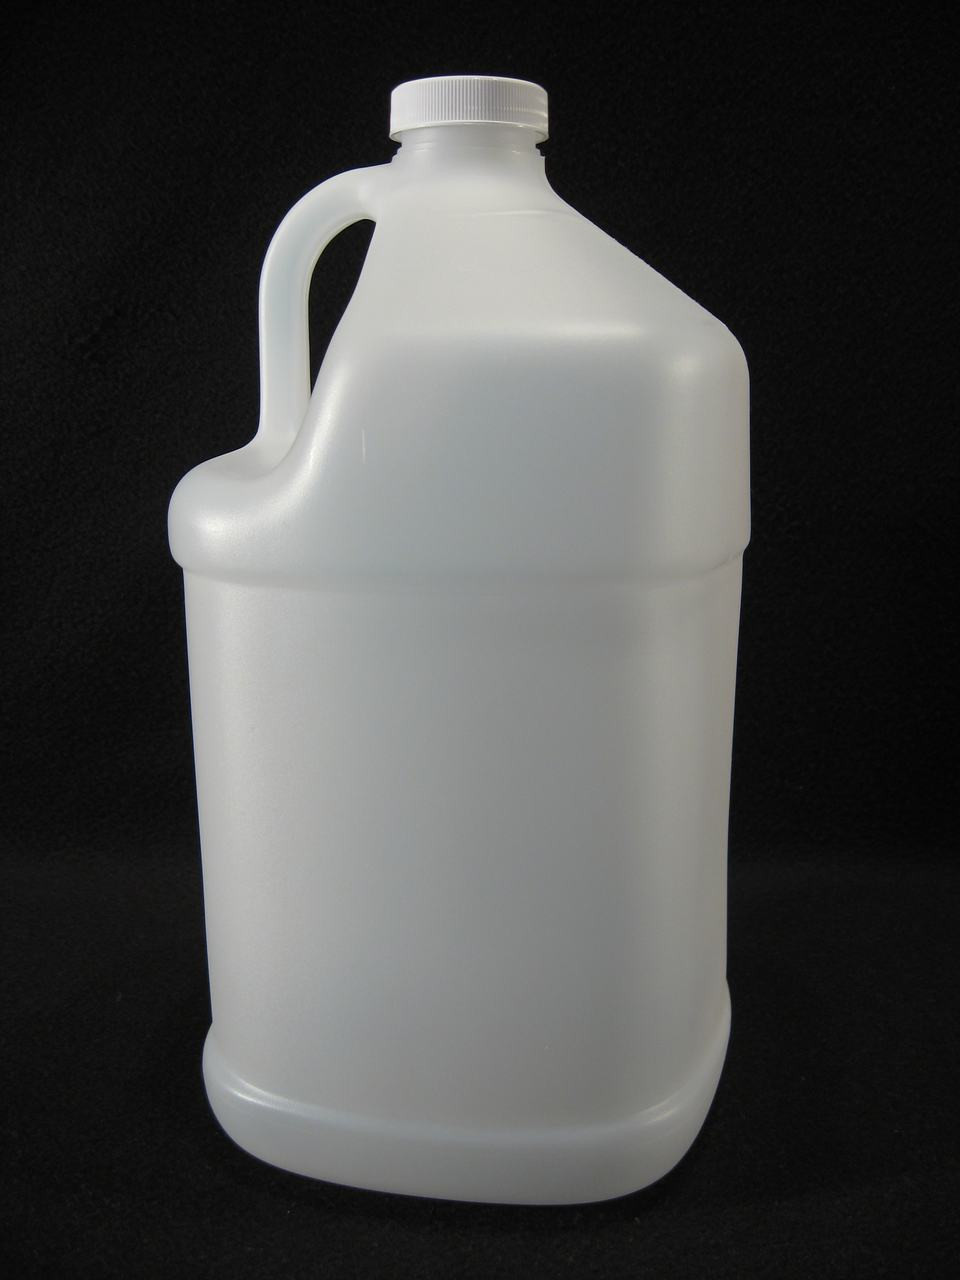 1 Gallon Economy Plastic Jugs - pack of 4